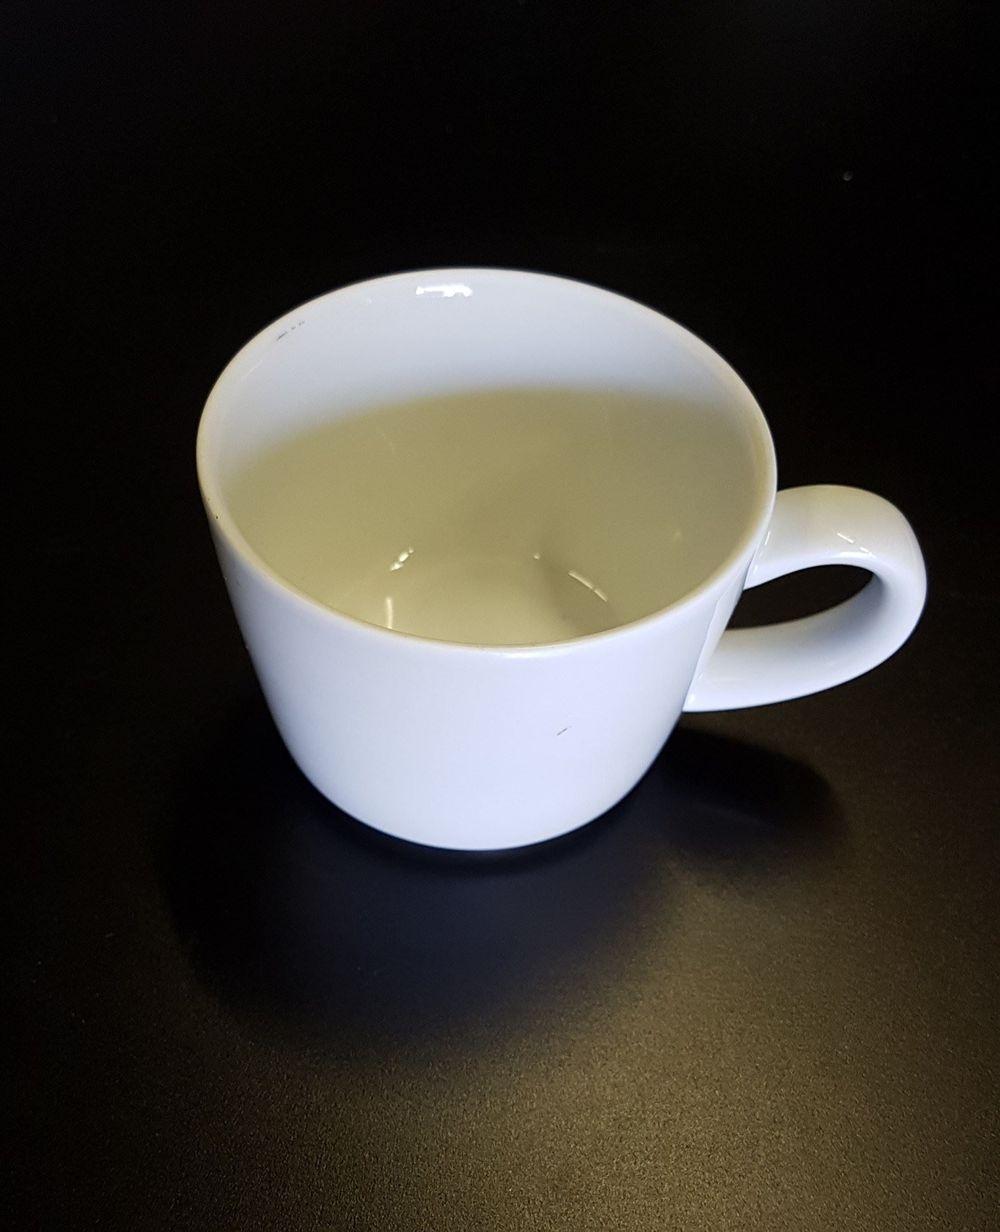 Kaffee Tasse - Fr. 0.50 pro / St.